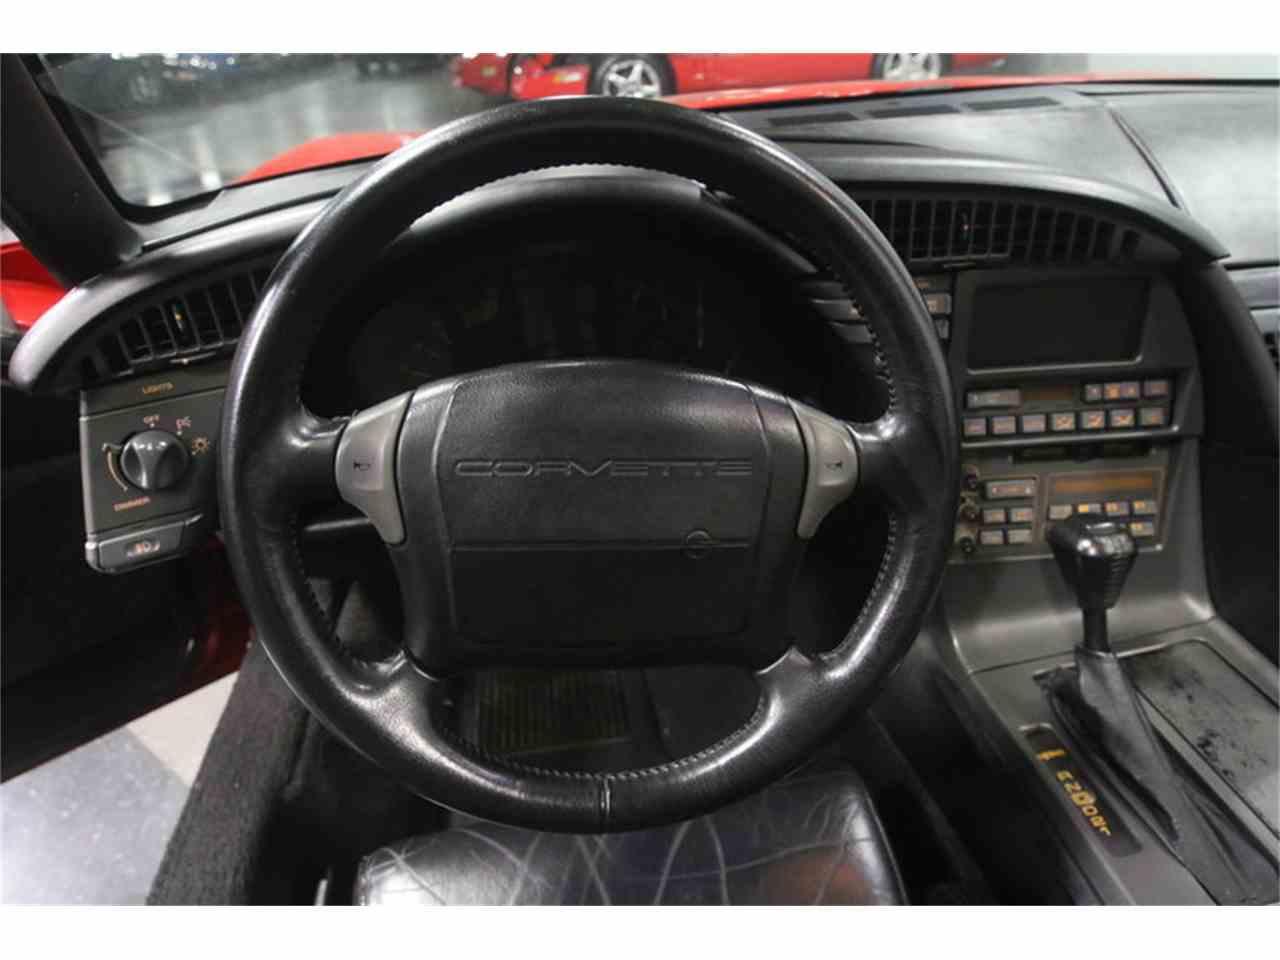 Large Picture of 1990 Corvette - $13,995.00 - MZ8M